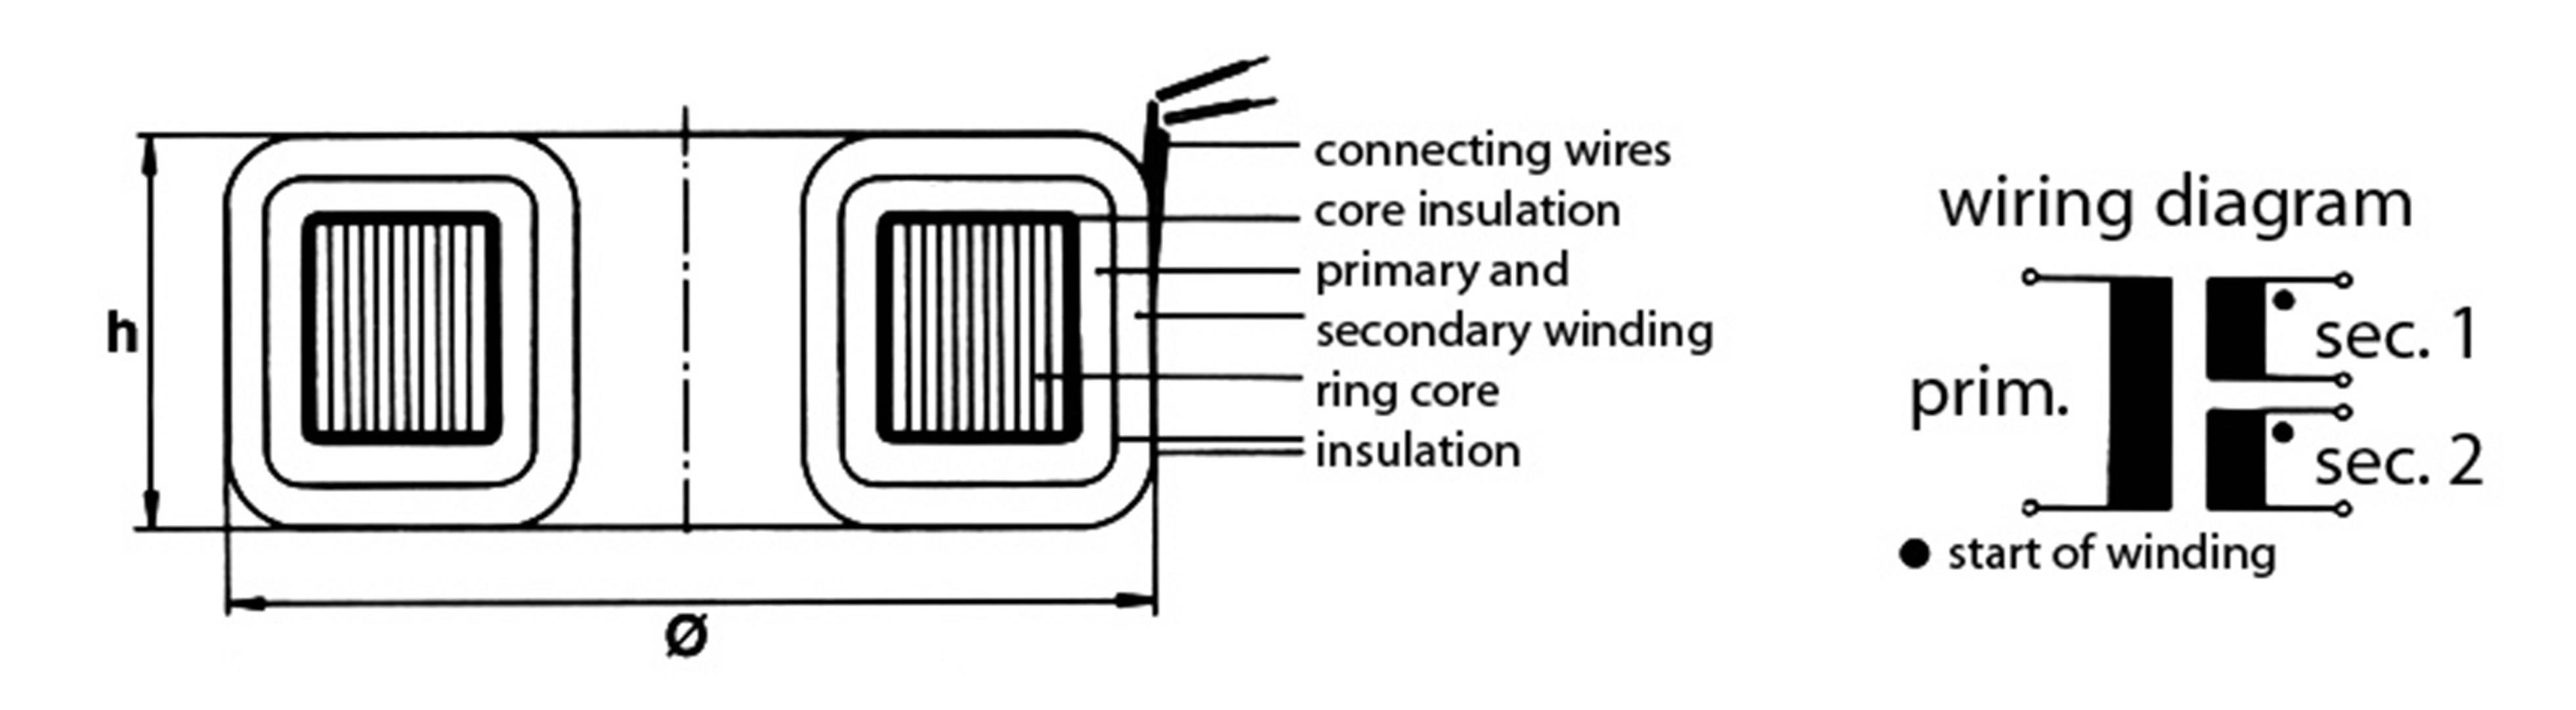 small resolution of toroidal core transformer 1 x 230 v 2 x 12 30 va 1250 ma